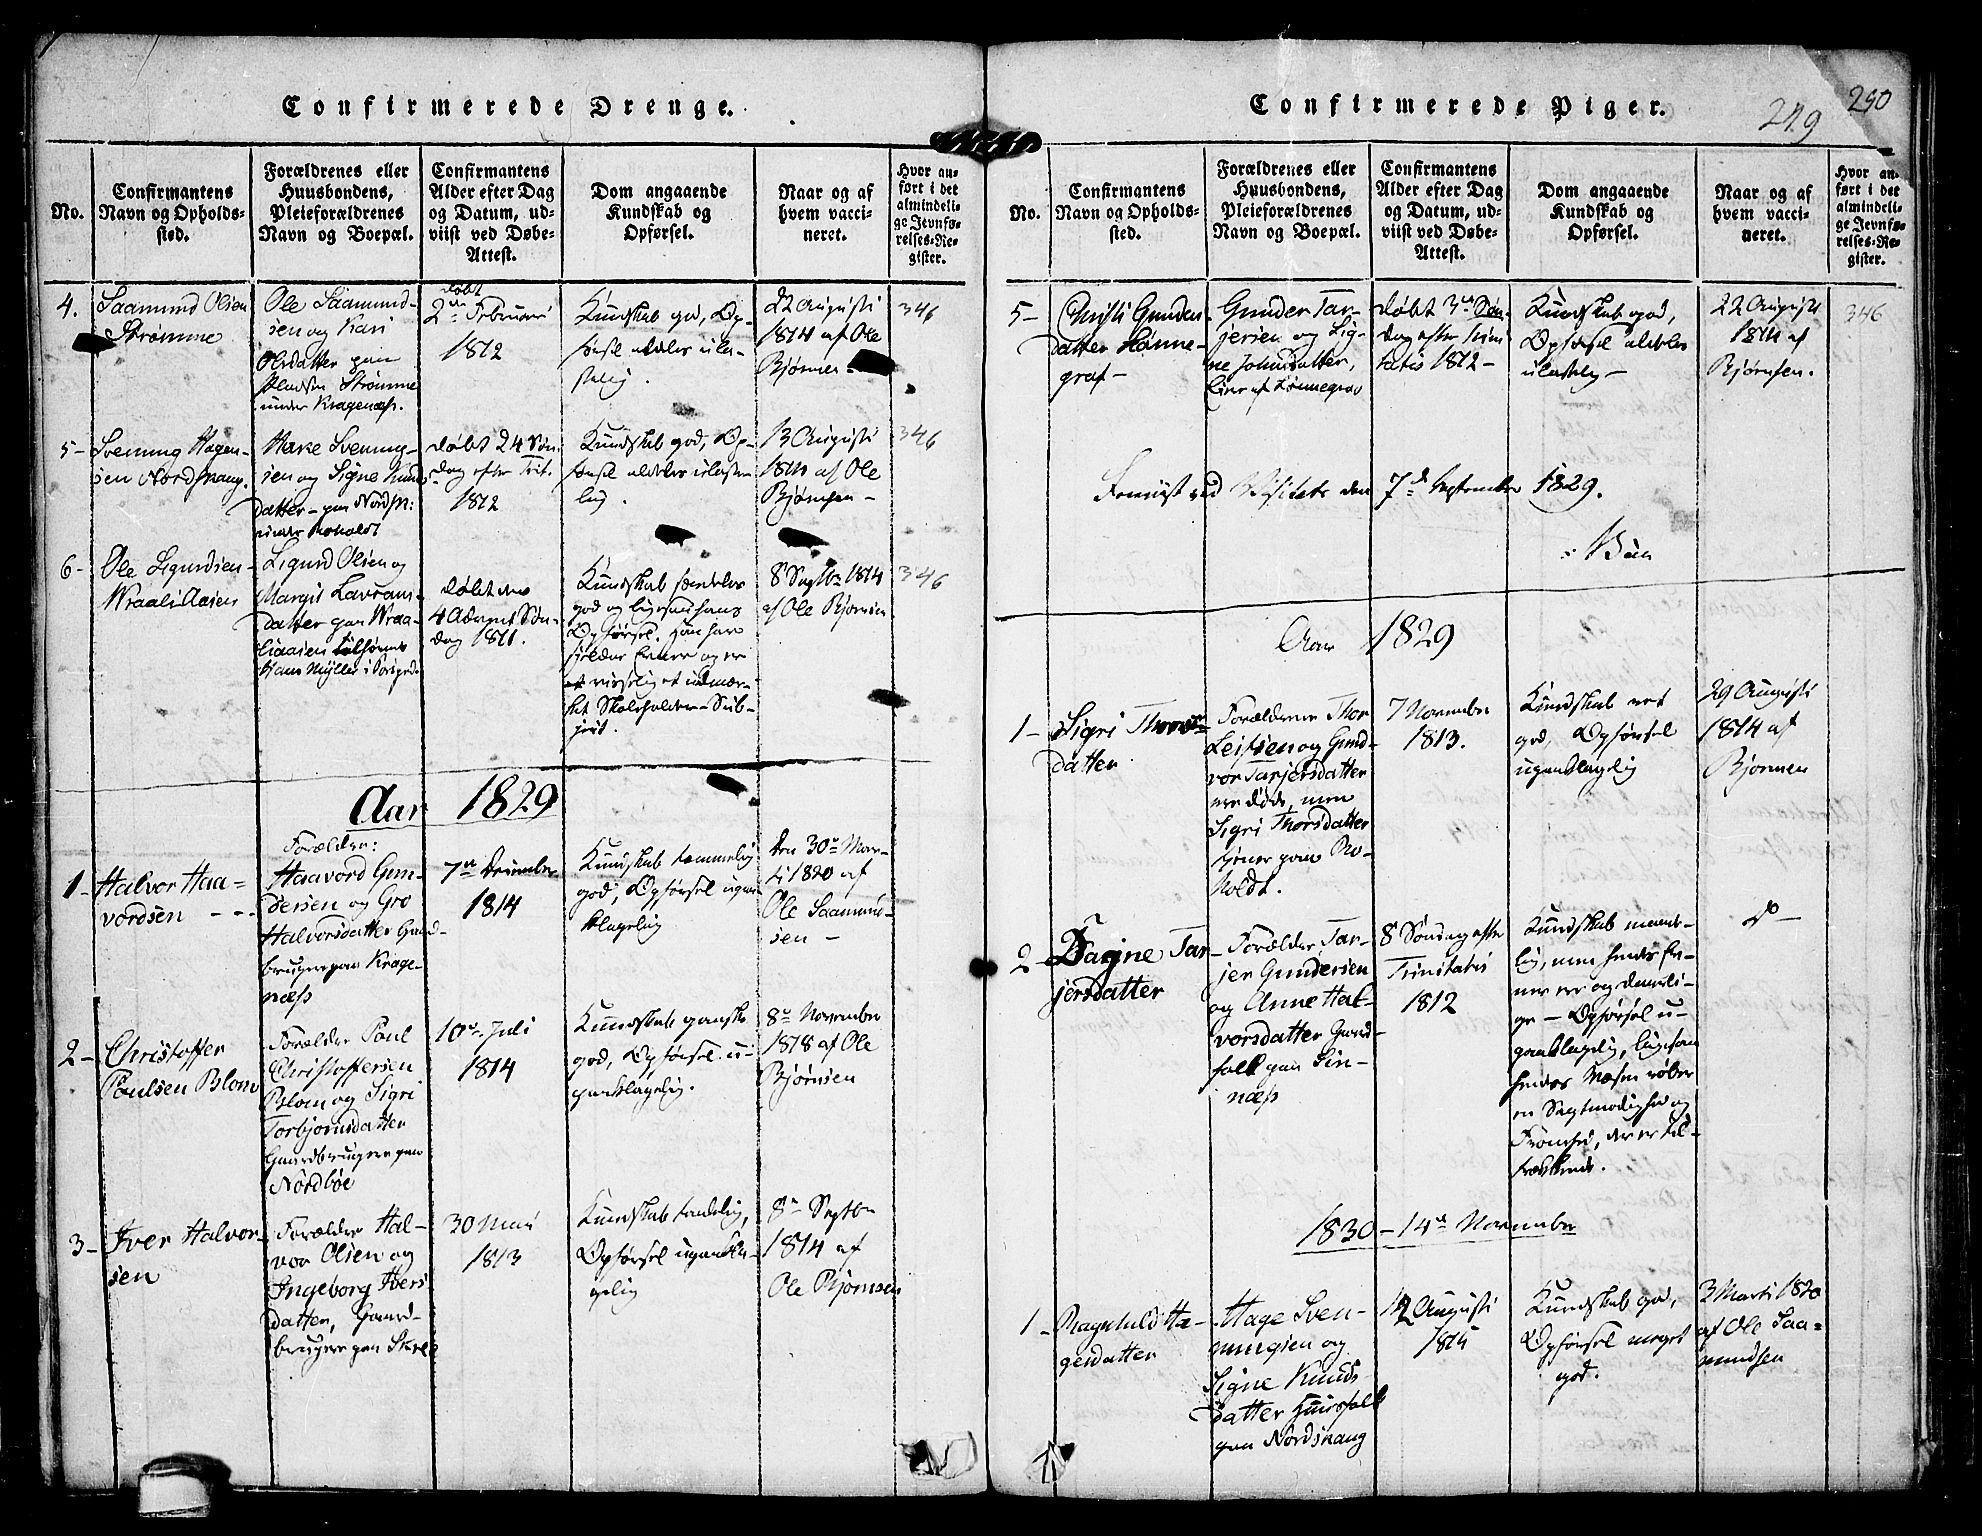 SAKO, Kviteseid kirkebøker, F/Fc/L0001: Ministerialbok nr. III 1, 1815-1836, s. 249